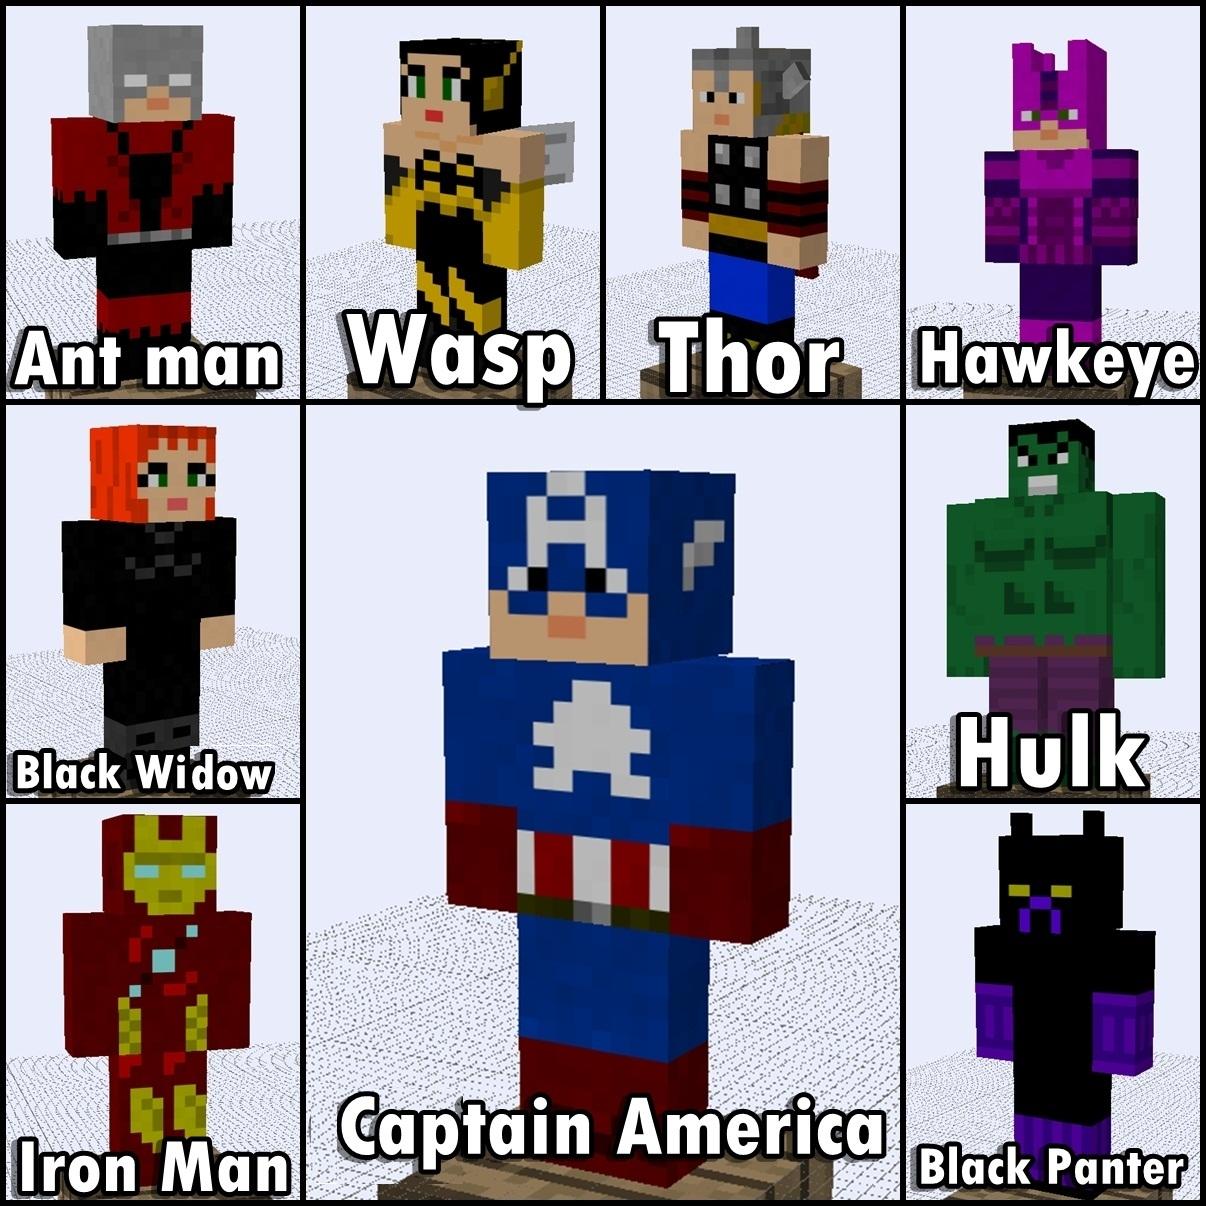 Avengers mod in minecraft